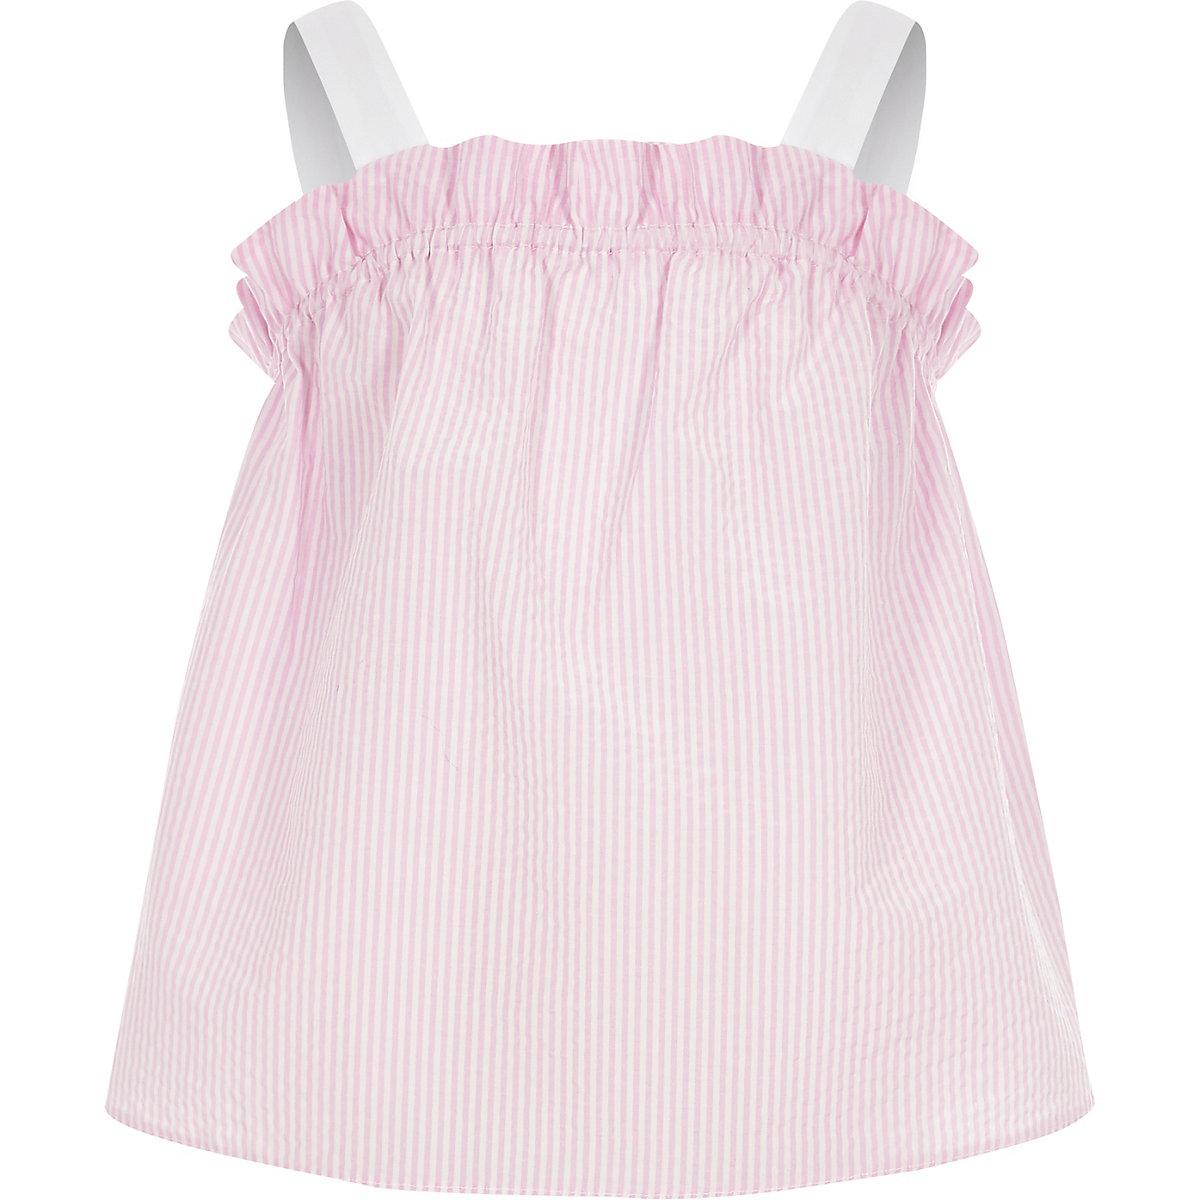 Girls pink stripe frill cami top